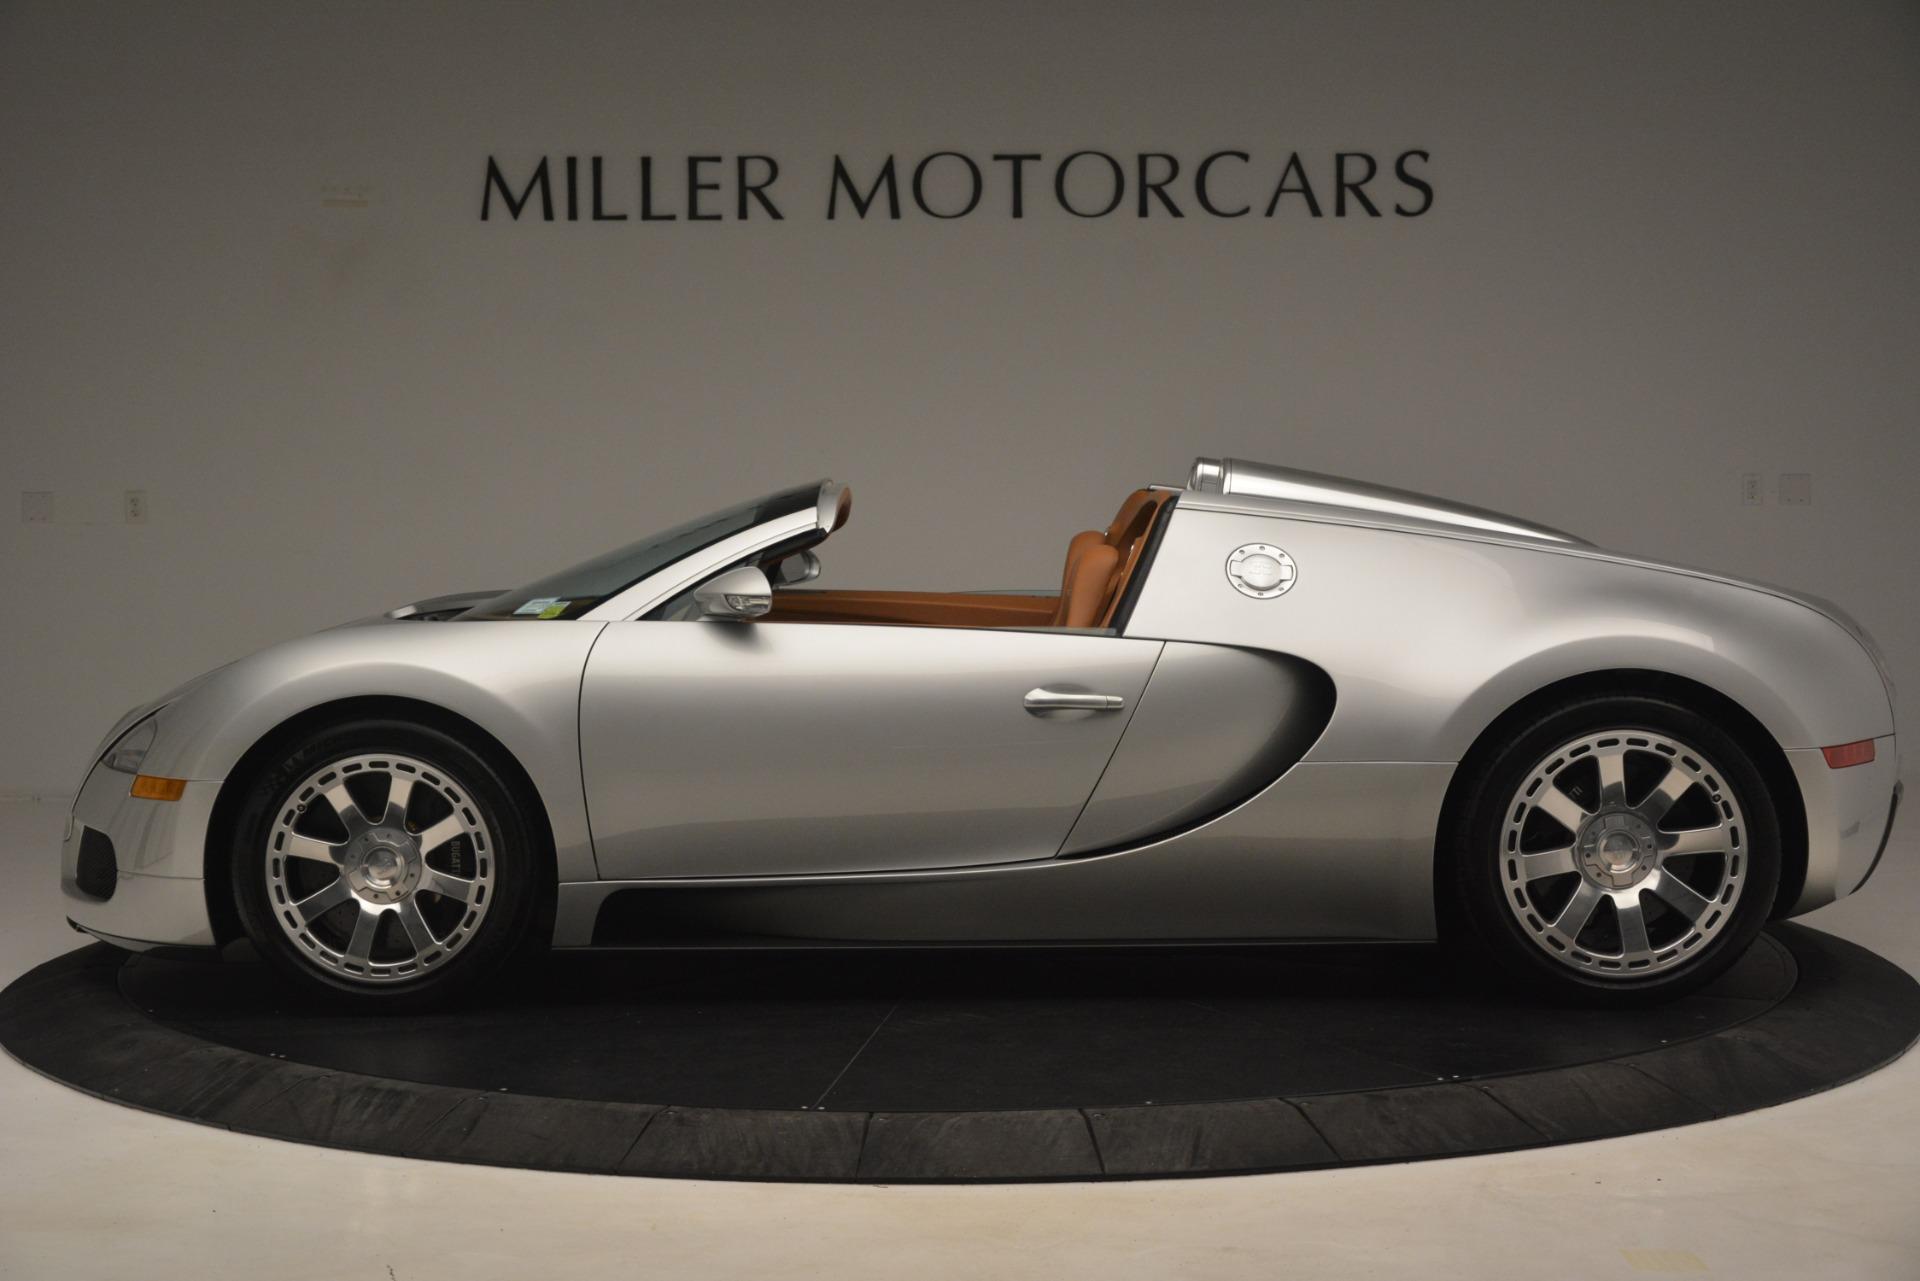 Used 2010 Bugatti Veyron 16.4 Grand Sport For Sale In Greenwich, CT 3159_p4